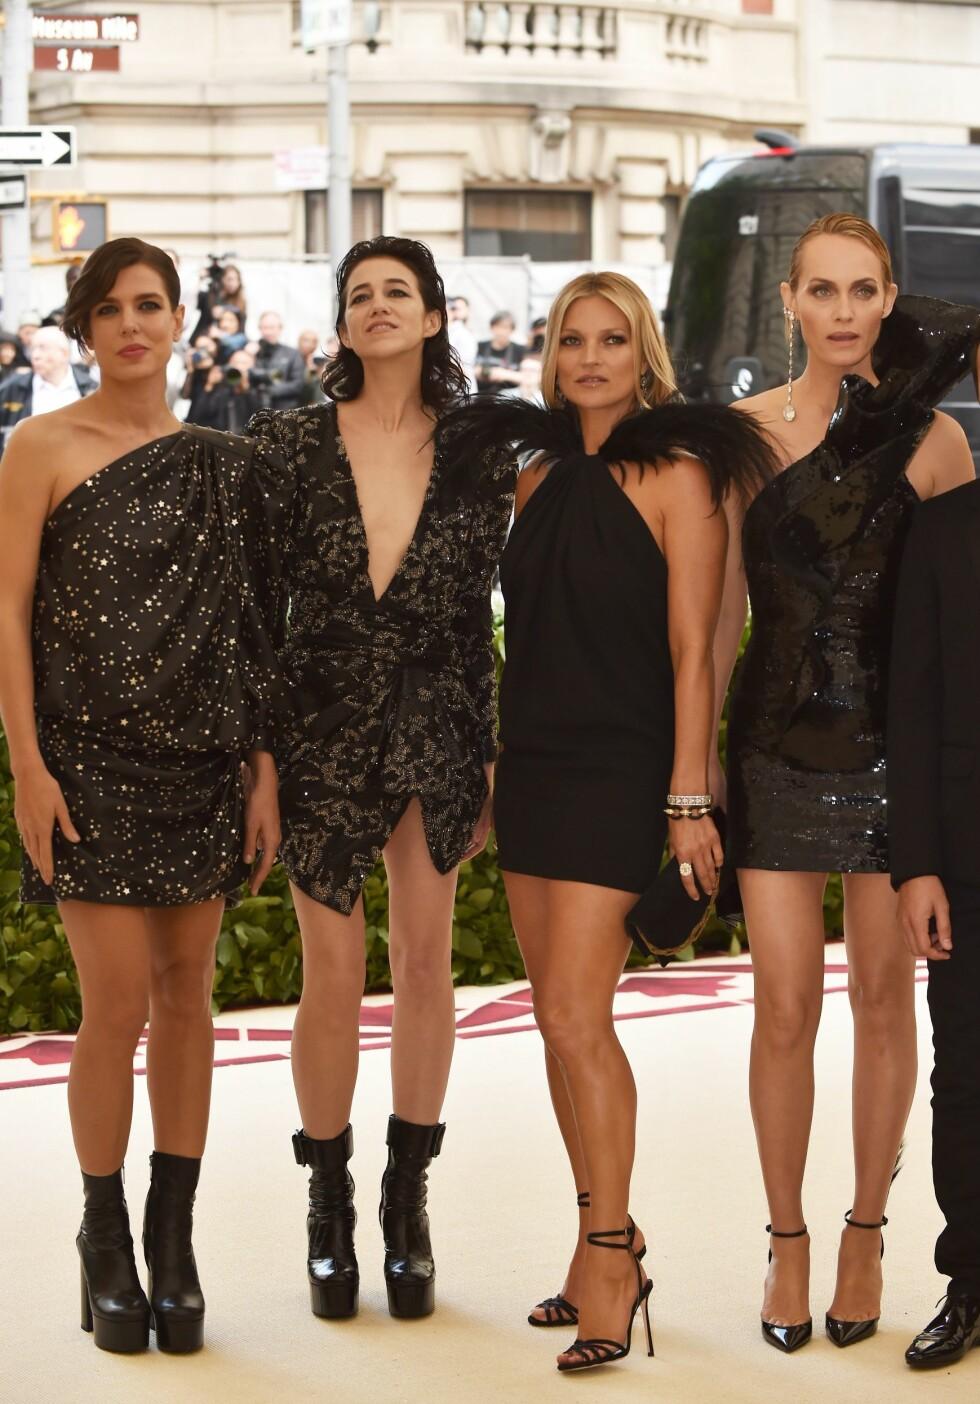 FIRERBANDE: Charlotte Casiraghi side om side med skuespiller Charlotte Gainsbourg, supermodellene Kate Moss og Amber Valetta under Met Gala i mai. FOTO: NTB Scanpix